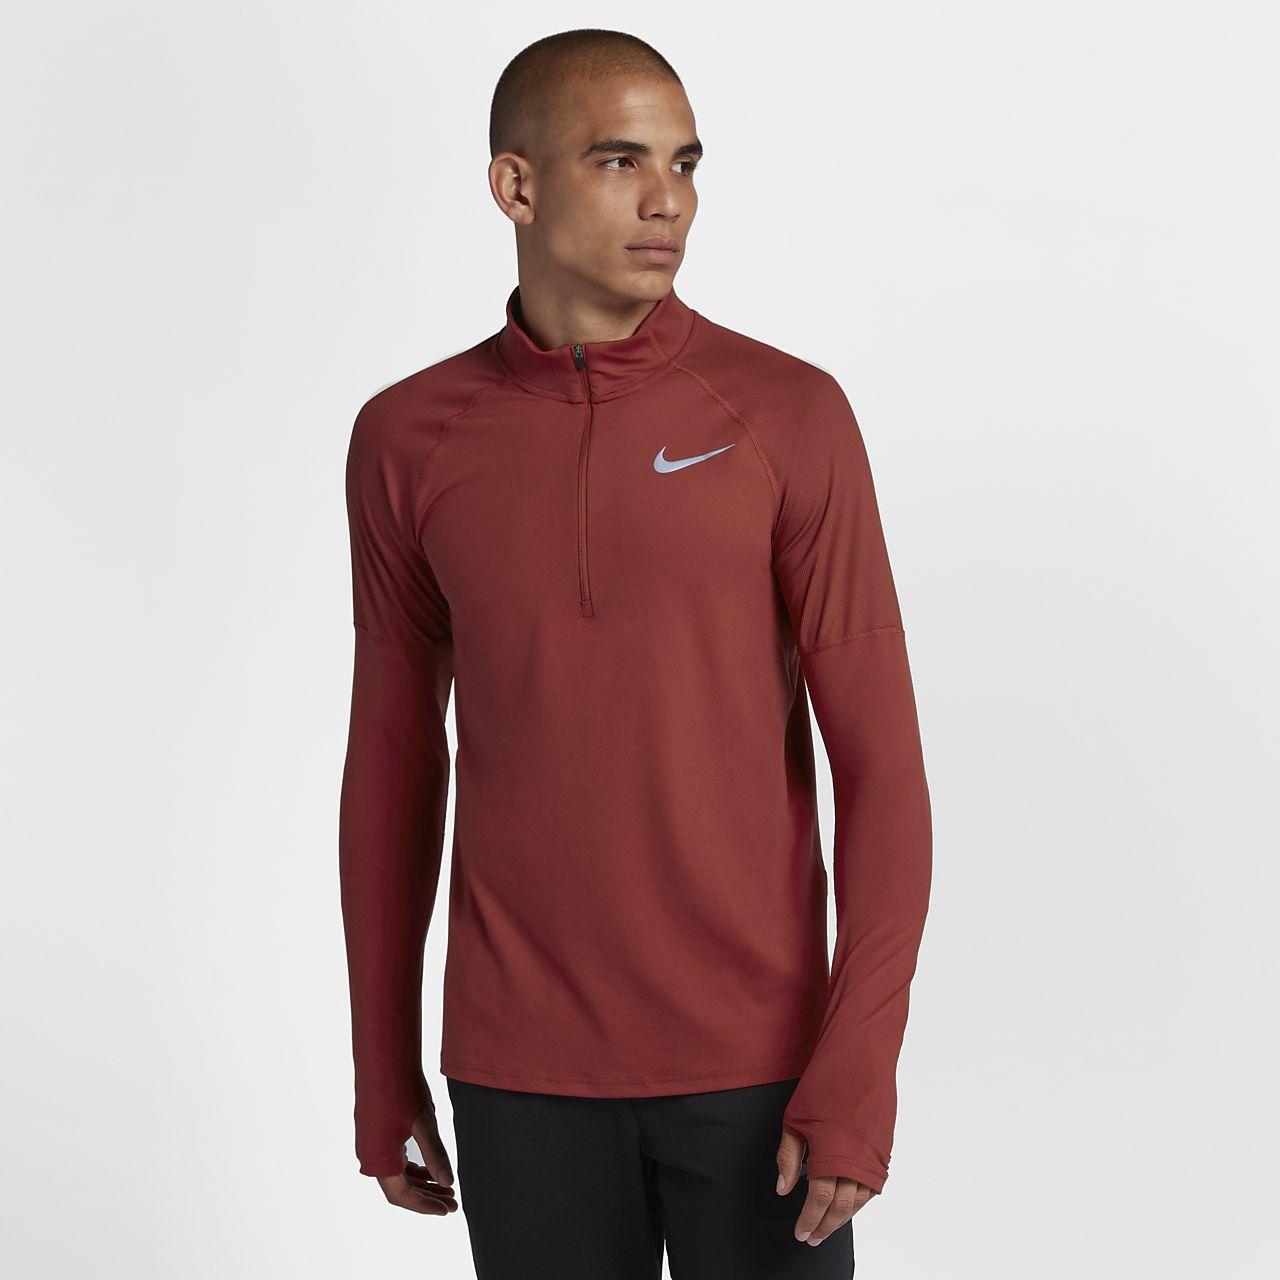 Be De Homme Nike Zip Haut Demi Pour Running À UC8HqHw